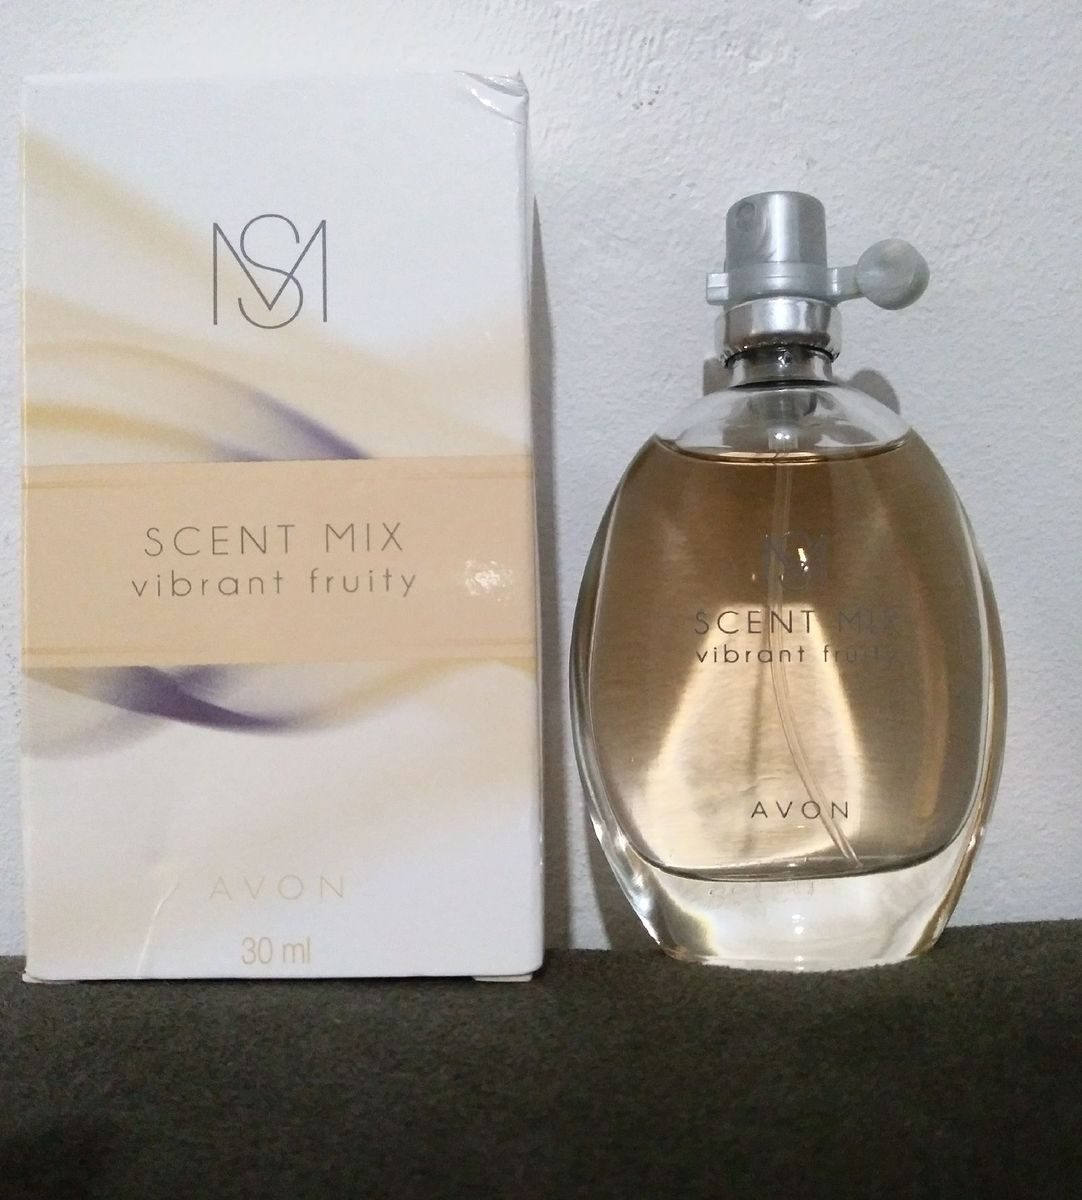 Avon Scent Mix Vibrant Fruit 30ml Perfume Feminino Avon Usado 35894492 Enjoei